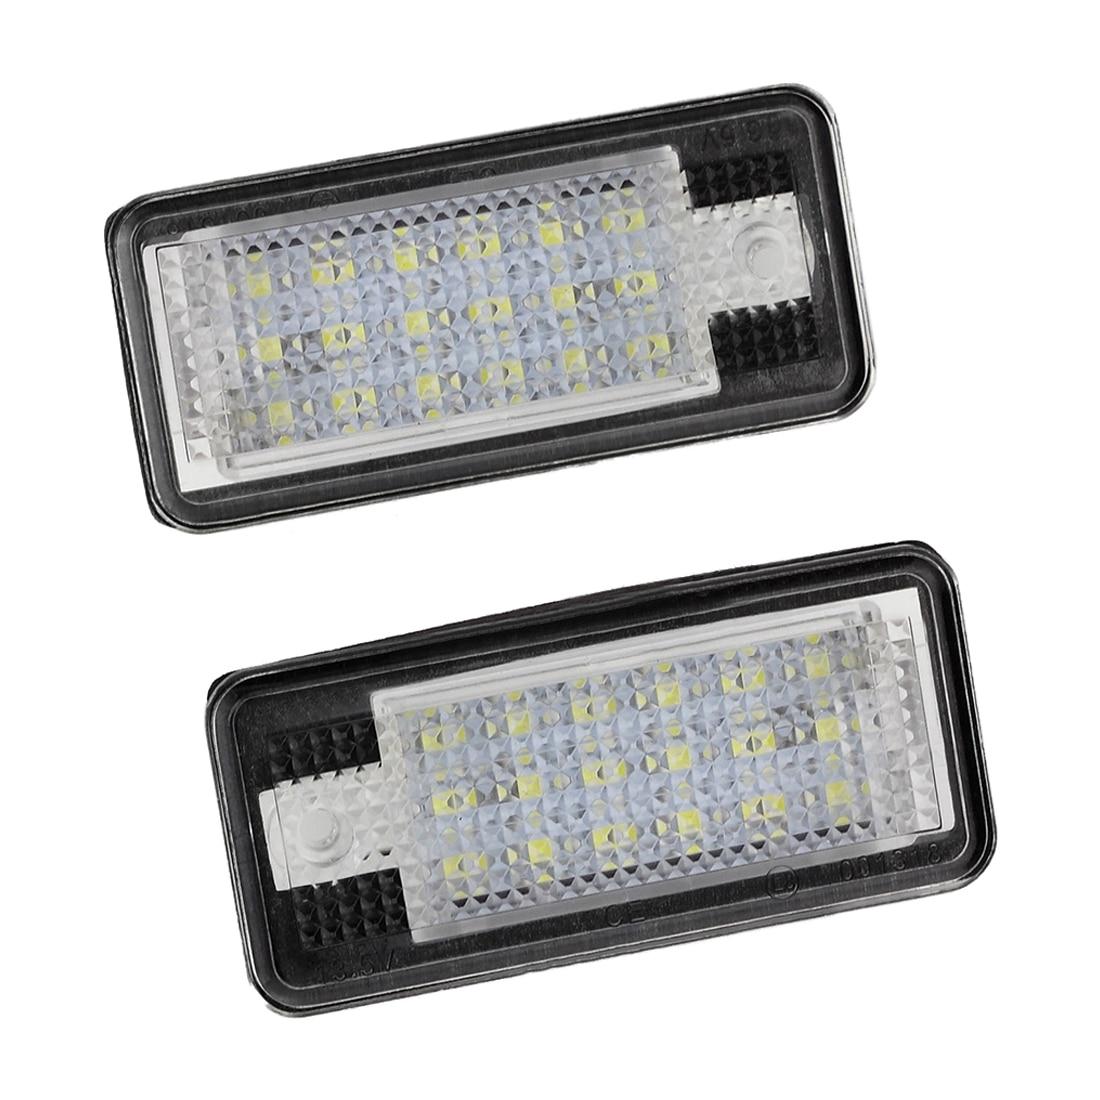 2x 18 LED License Number Plate Light Lamp For Audi A3 S3 A4 S4 B6 A6 S6 A8 S8 Q7 доска для объявлений dz 1 2 j8b [6 ] jndx 8 s b